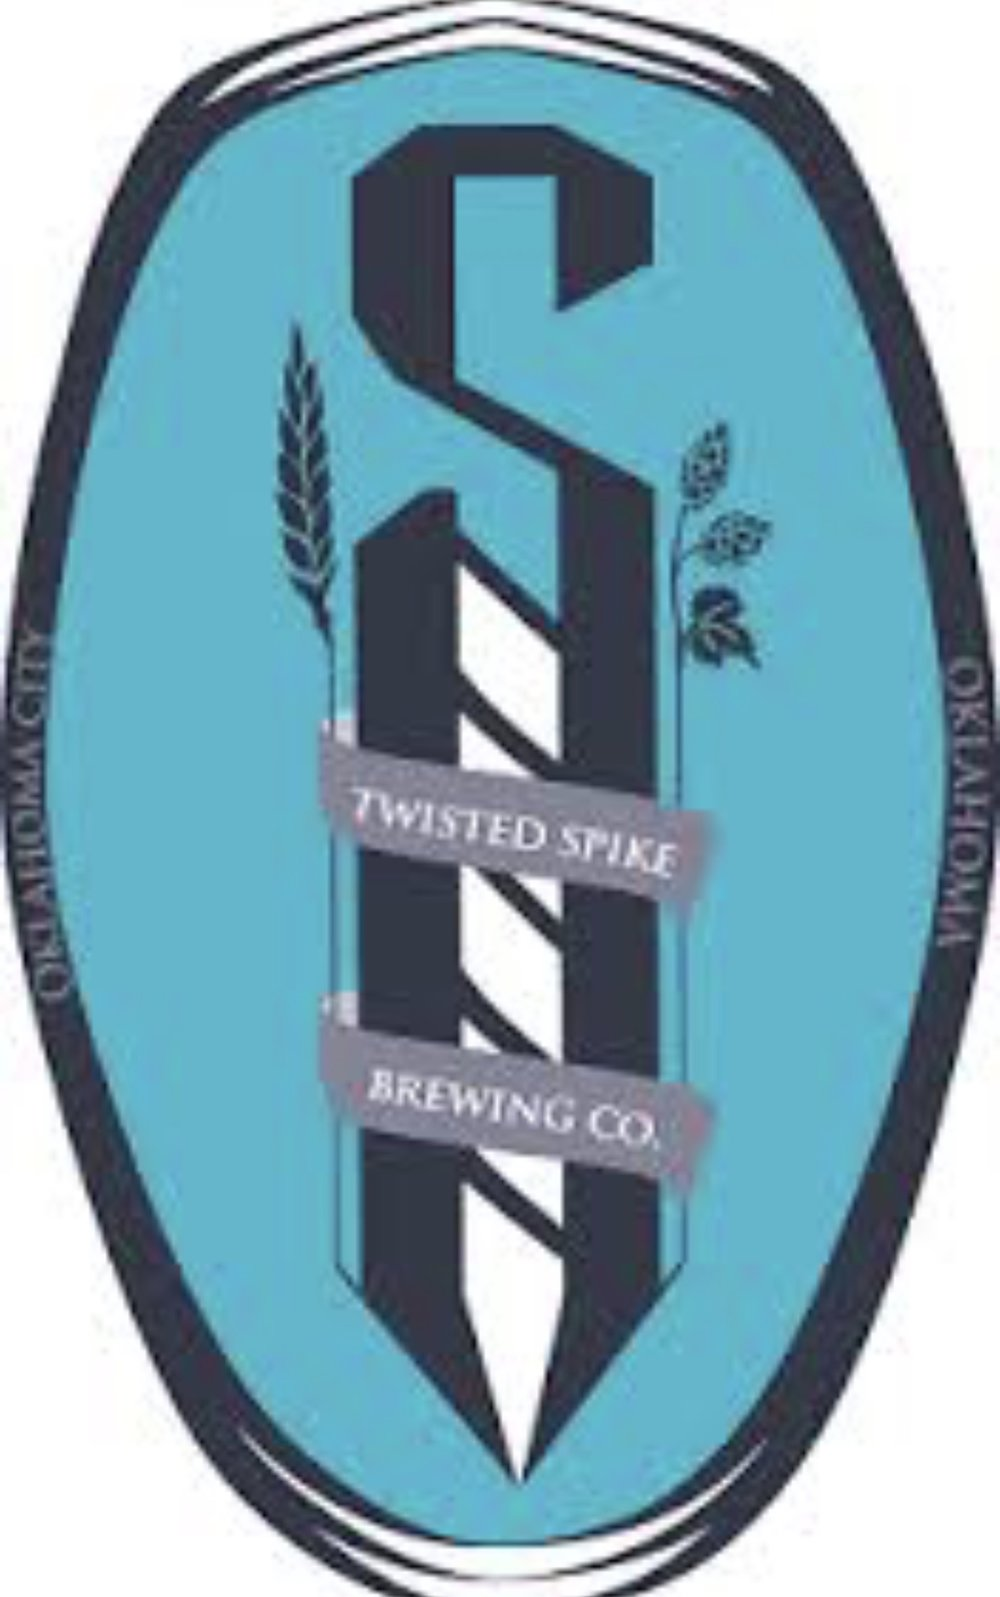 Twisted Spike brewing co..jpg